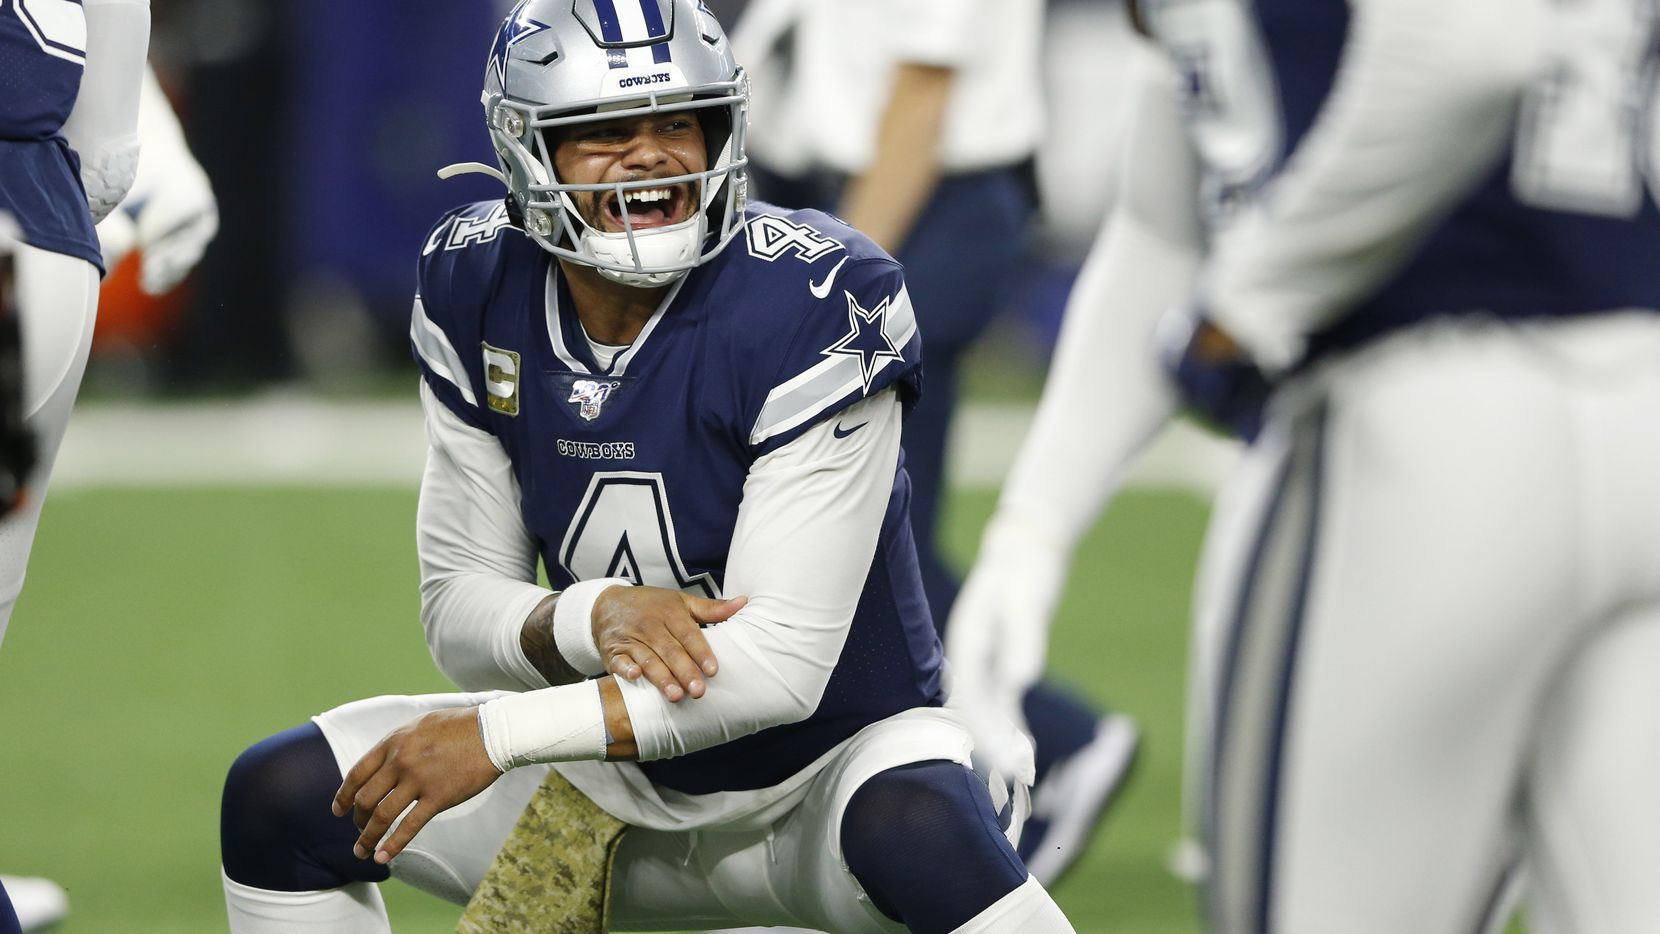 Dallas Cowboys quarterback Dak Prescott (4) greets his teammates before a game against the Minnesota Vikings in Arlington, Texas on Sunday, November 10, 2019. (Vernon Bryant/The Dallas Morning News)